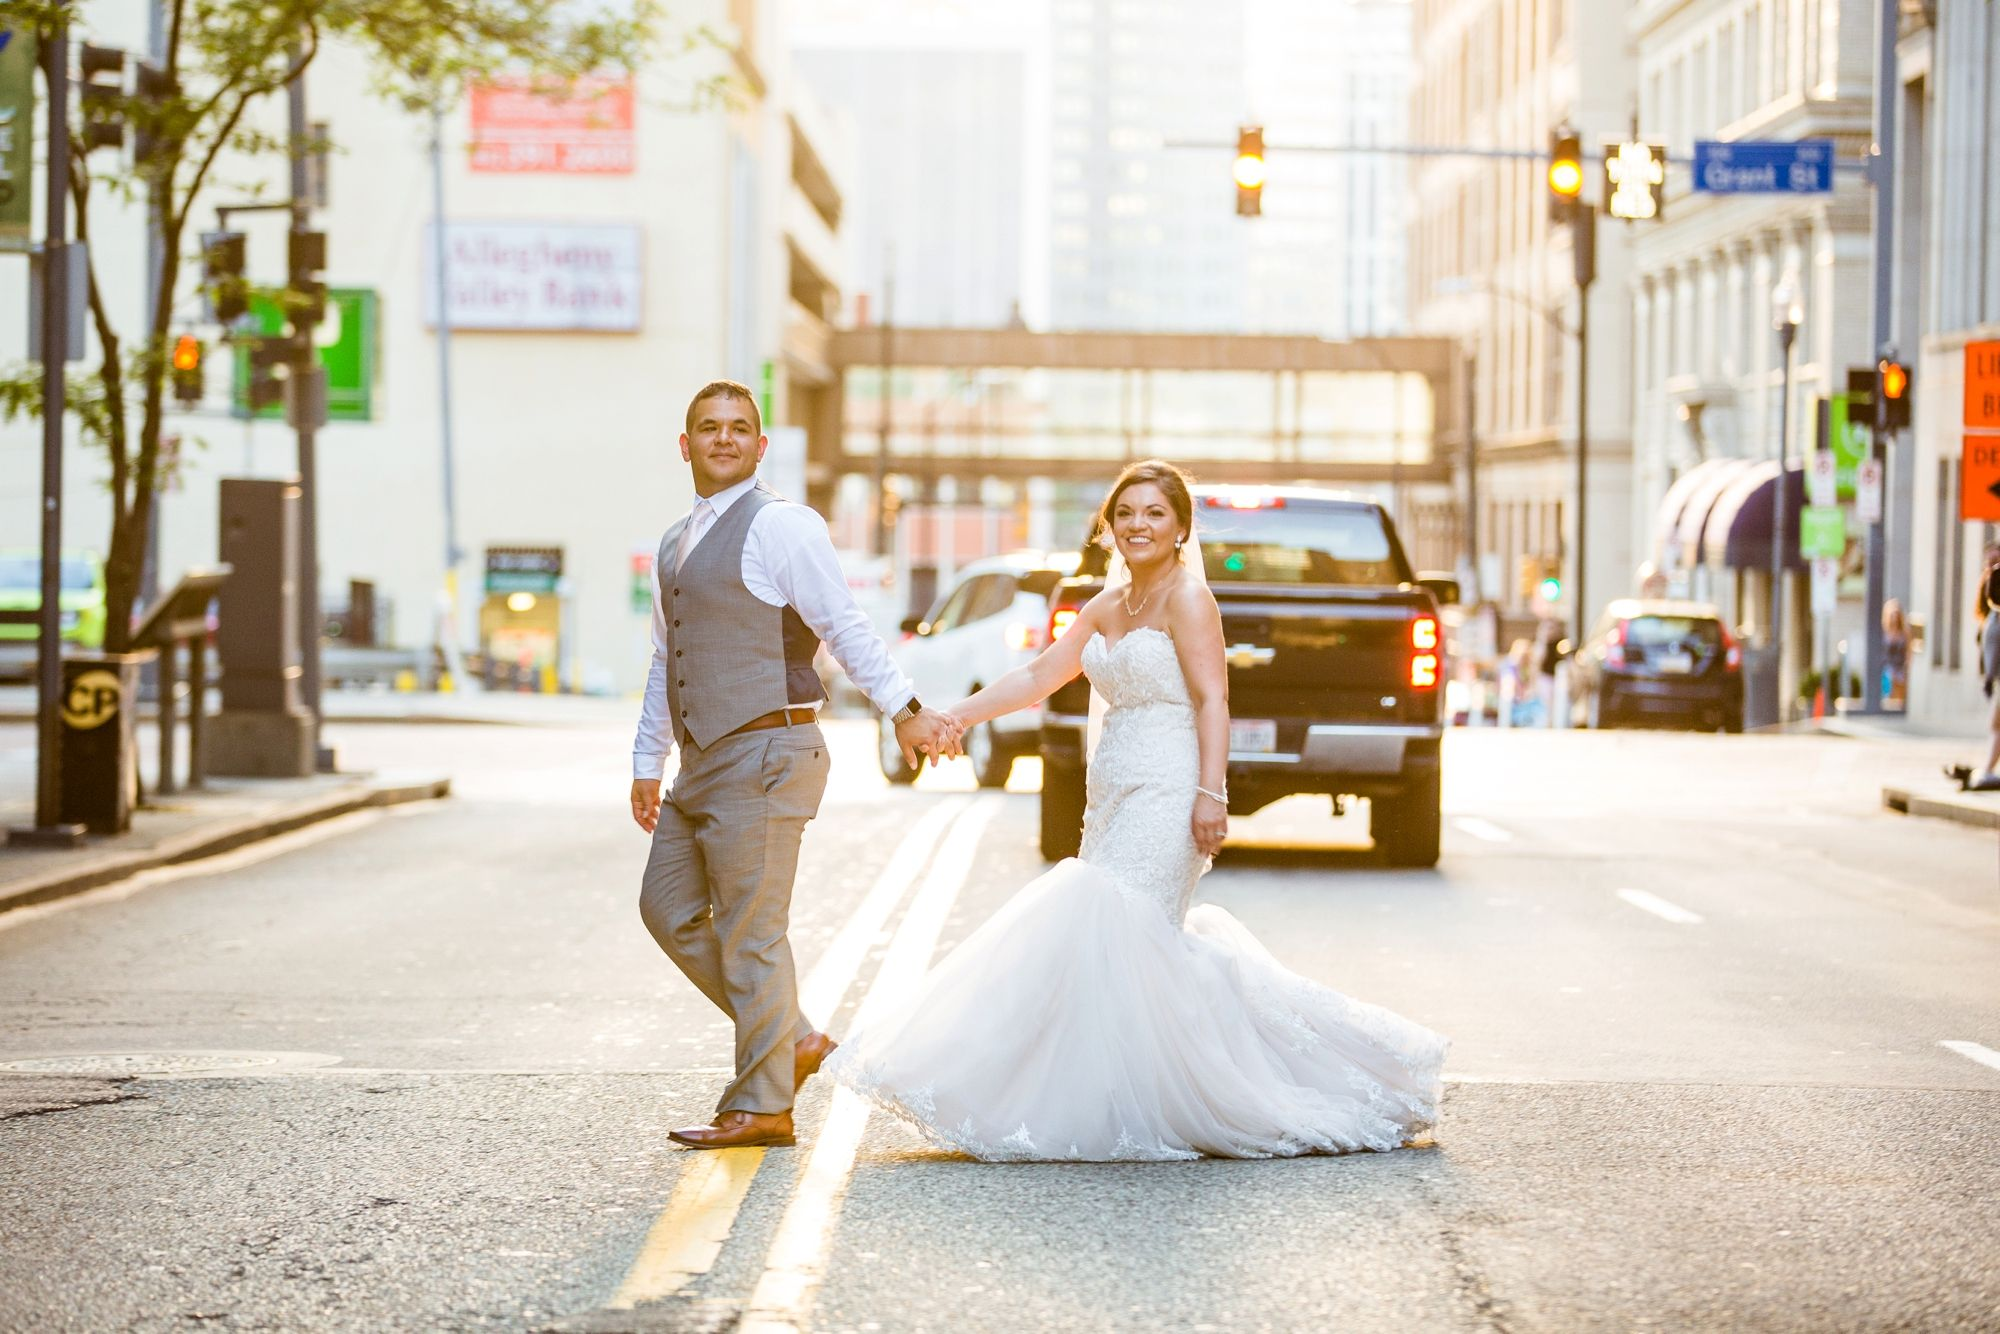 Wedding dresses pittsburgh  Should I Send My Photographer My Wedding Pinterest Board  Jenna